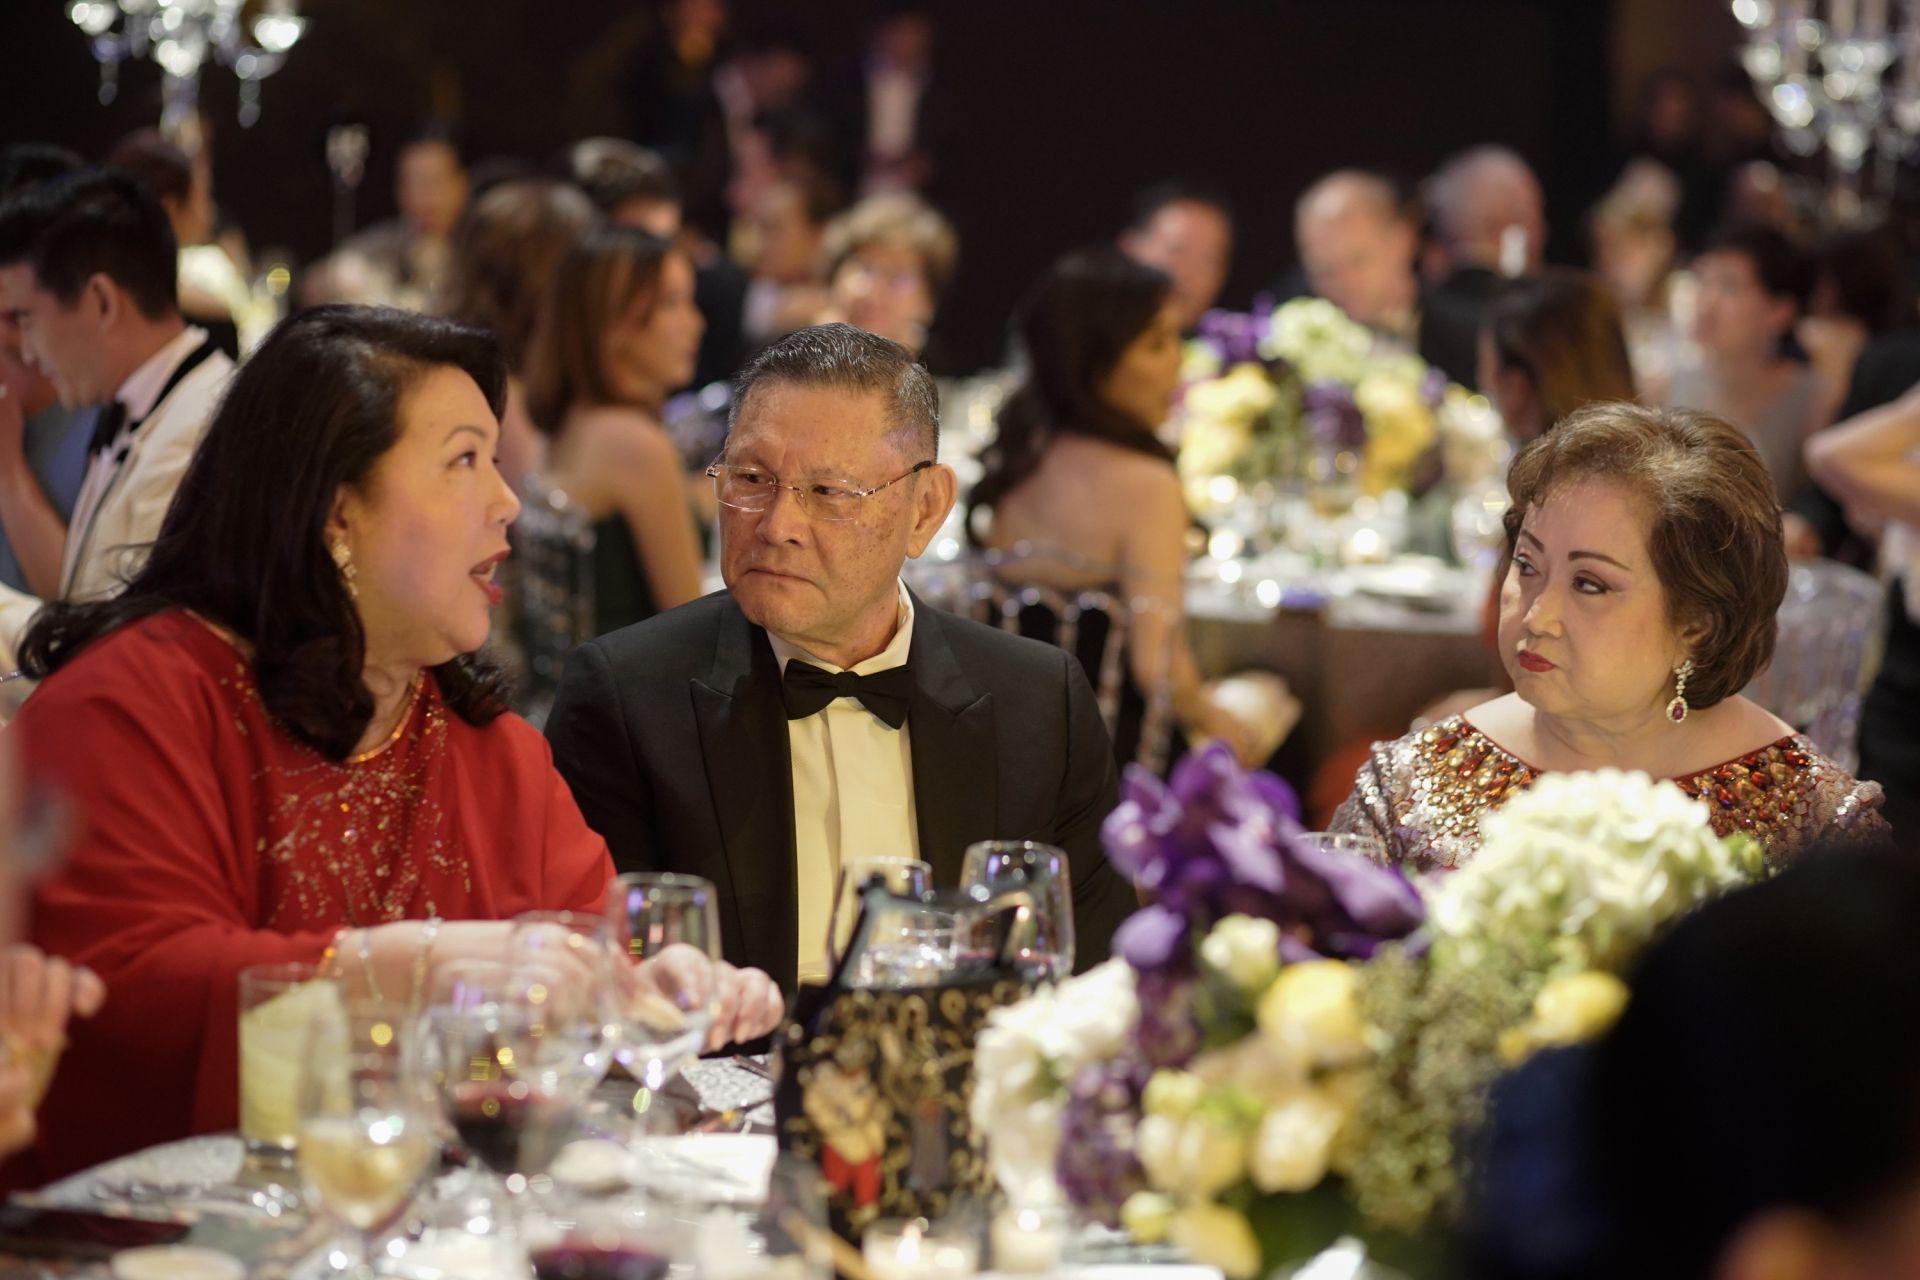 Irene Martel Francisco, Manuel Cojuanco, Nedy Tantoco